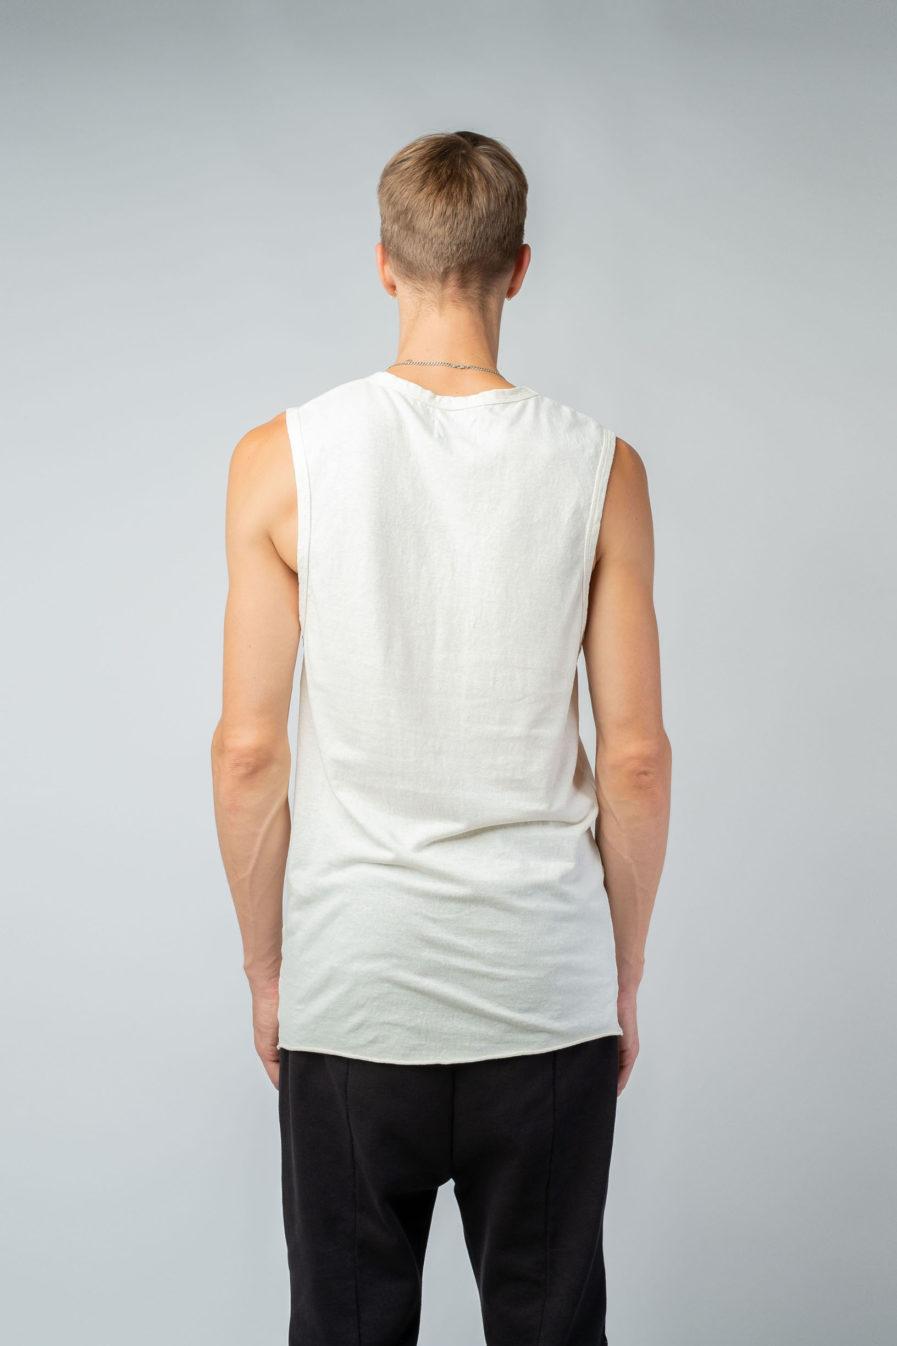 MAN unisex singlet tanktop hemp organic cotton DRIES Blank canvas back